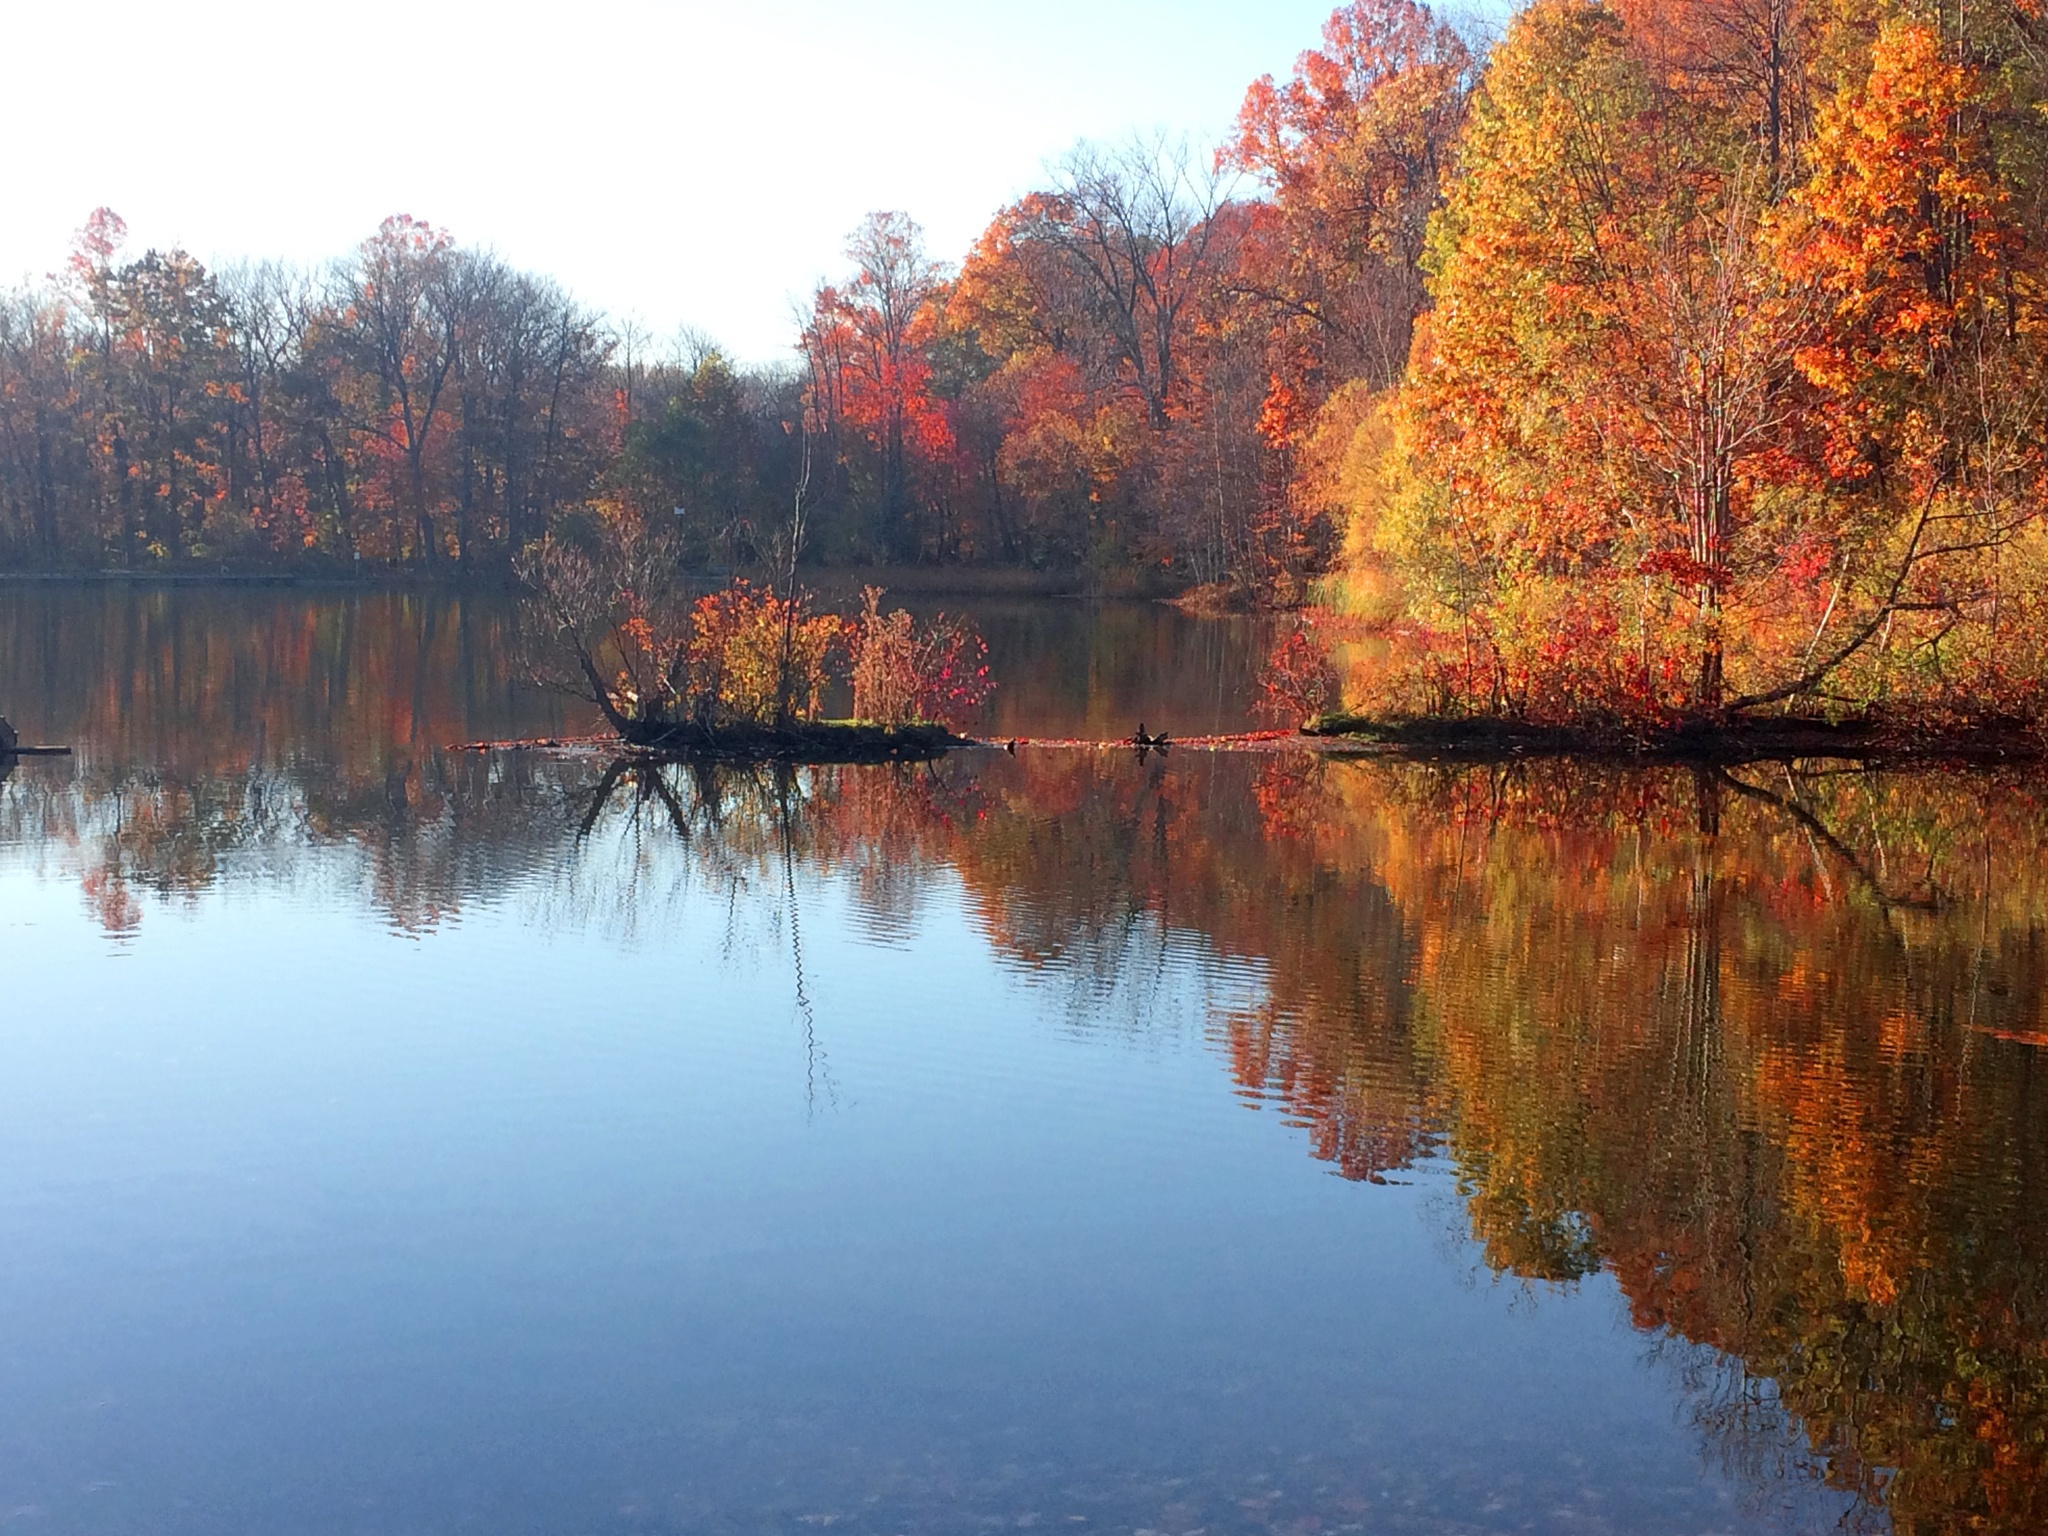 Autumn Reflection by Phillip W. Strunk